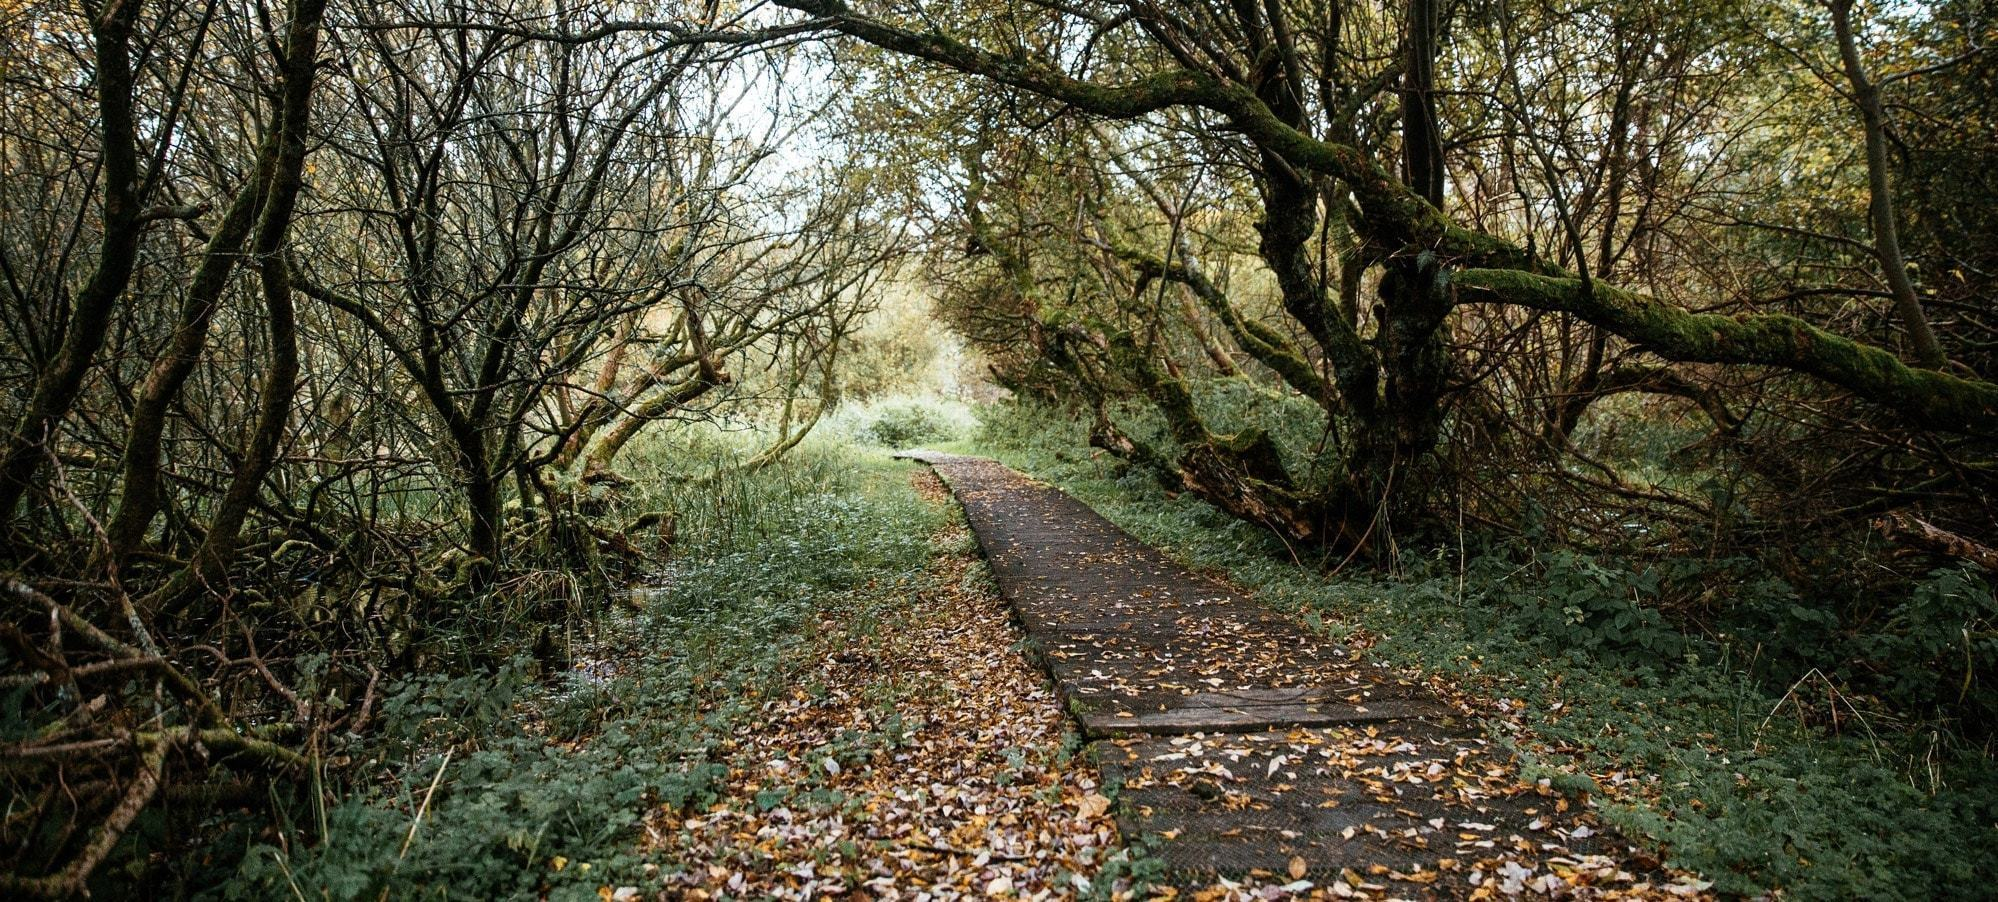 Photo d'un chemin